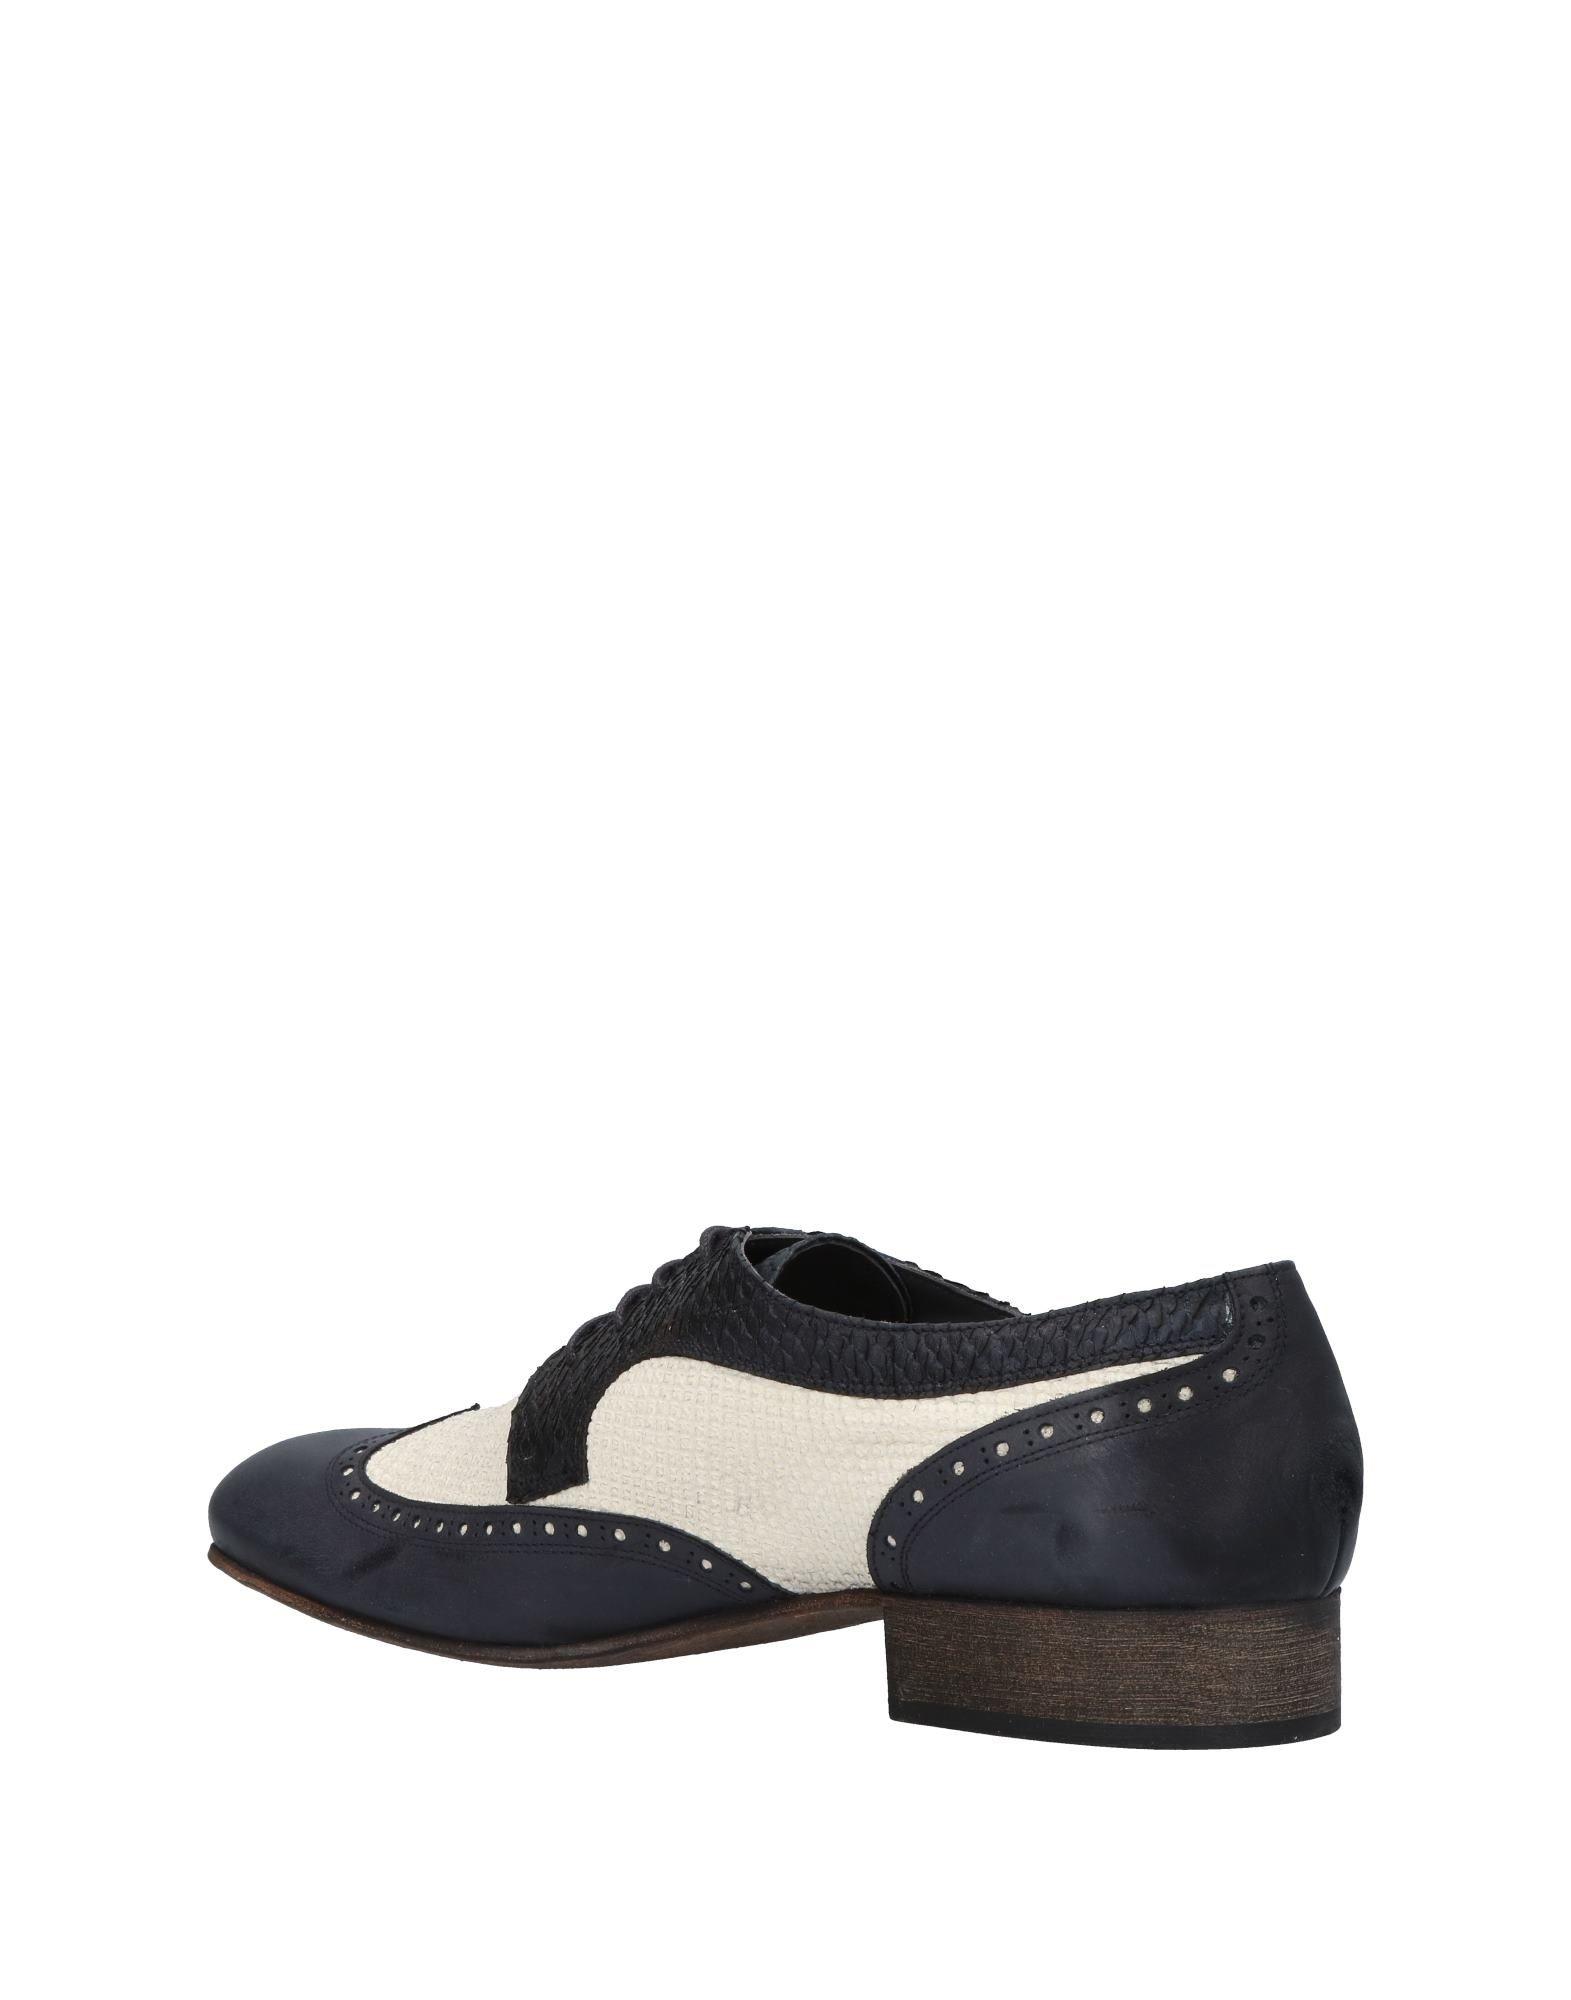 CHAUSSURES - Chaussures à lacetsHypnosi jyIJlRvA6